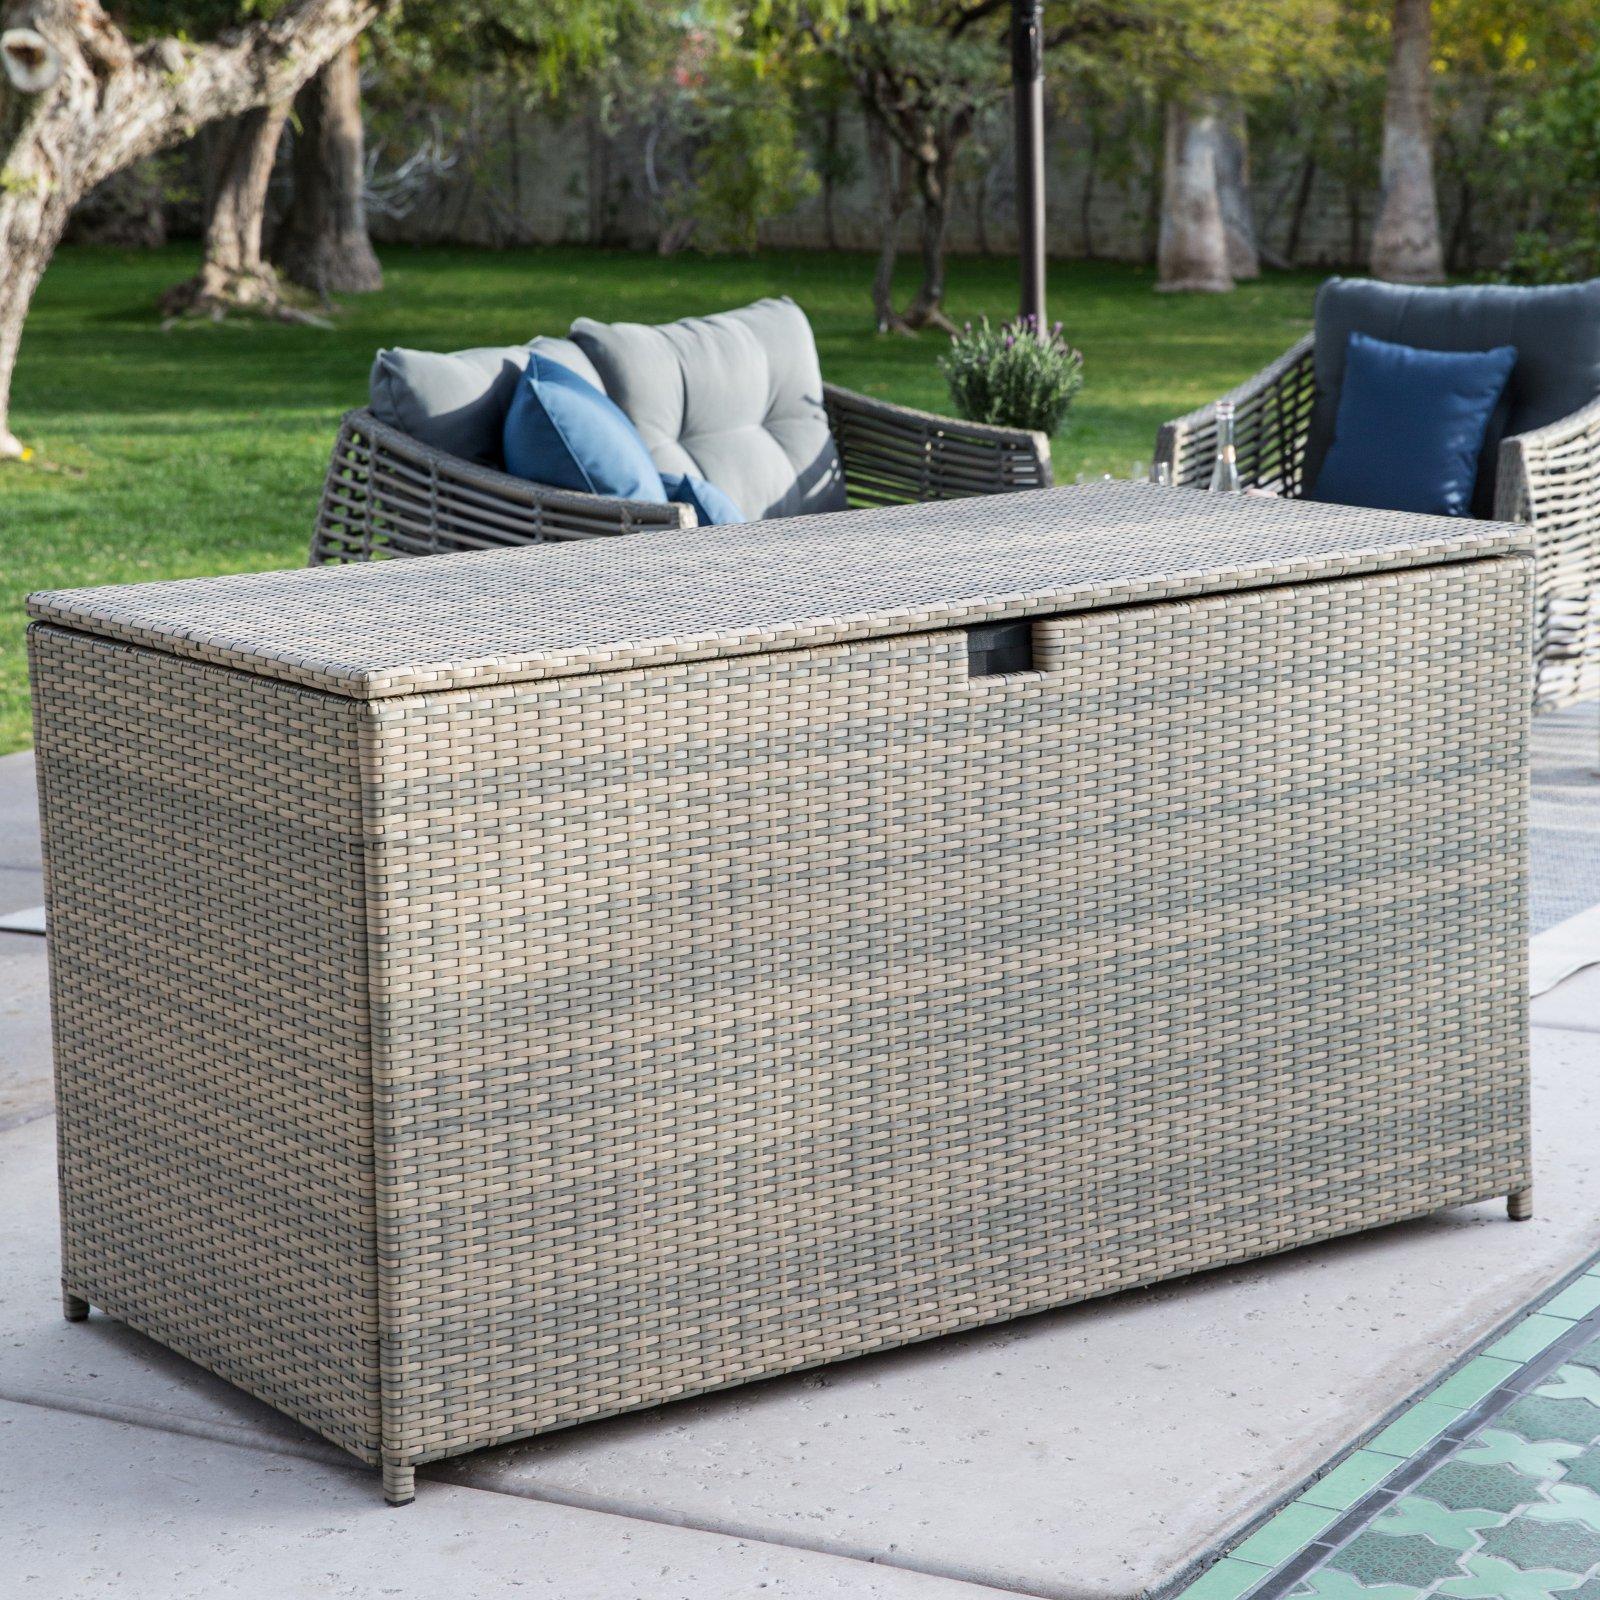 Belham Living Kambree All-Weather Wicker 190-Gallon Deck Box